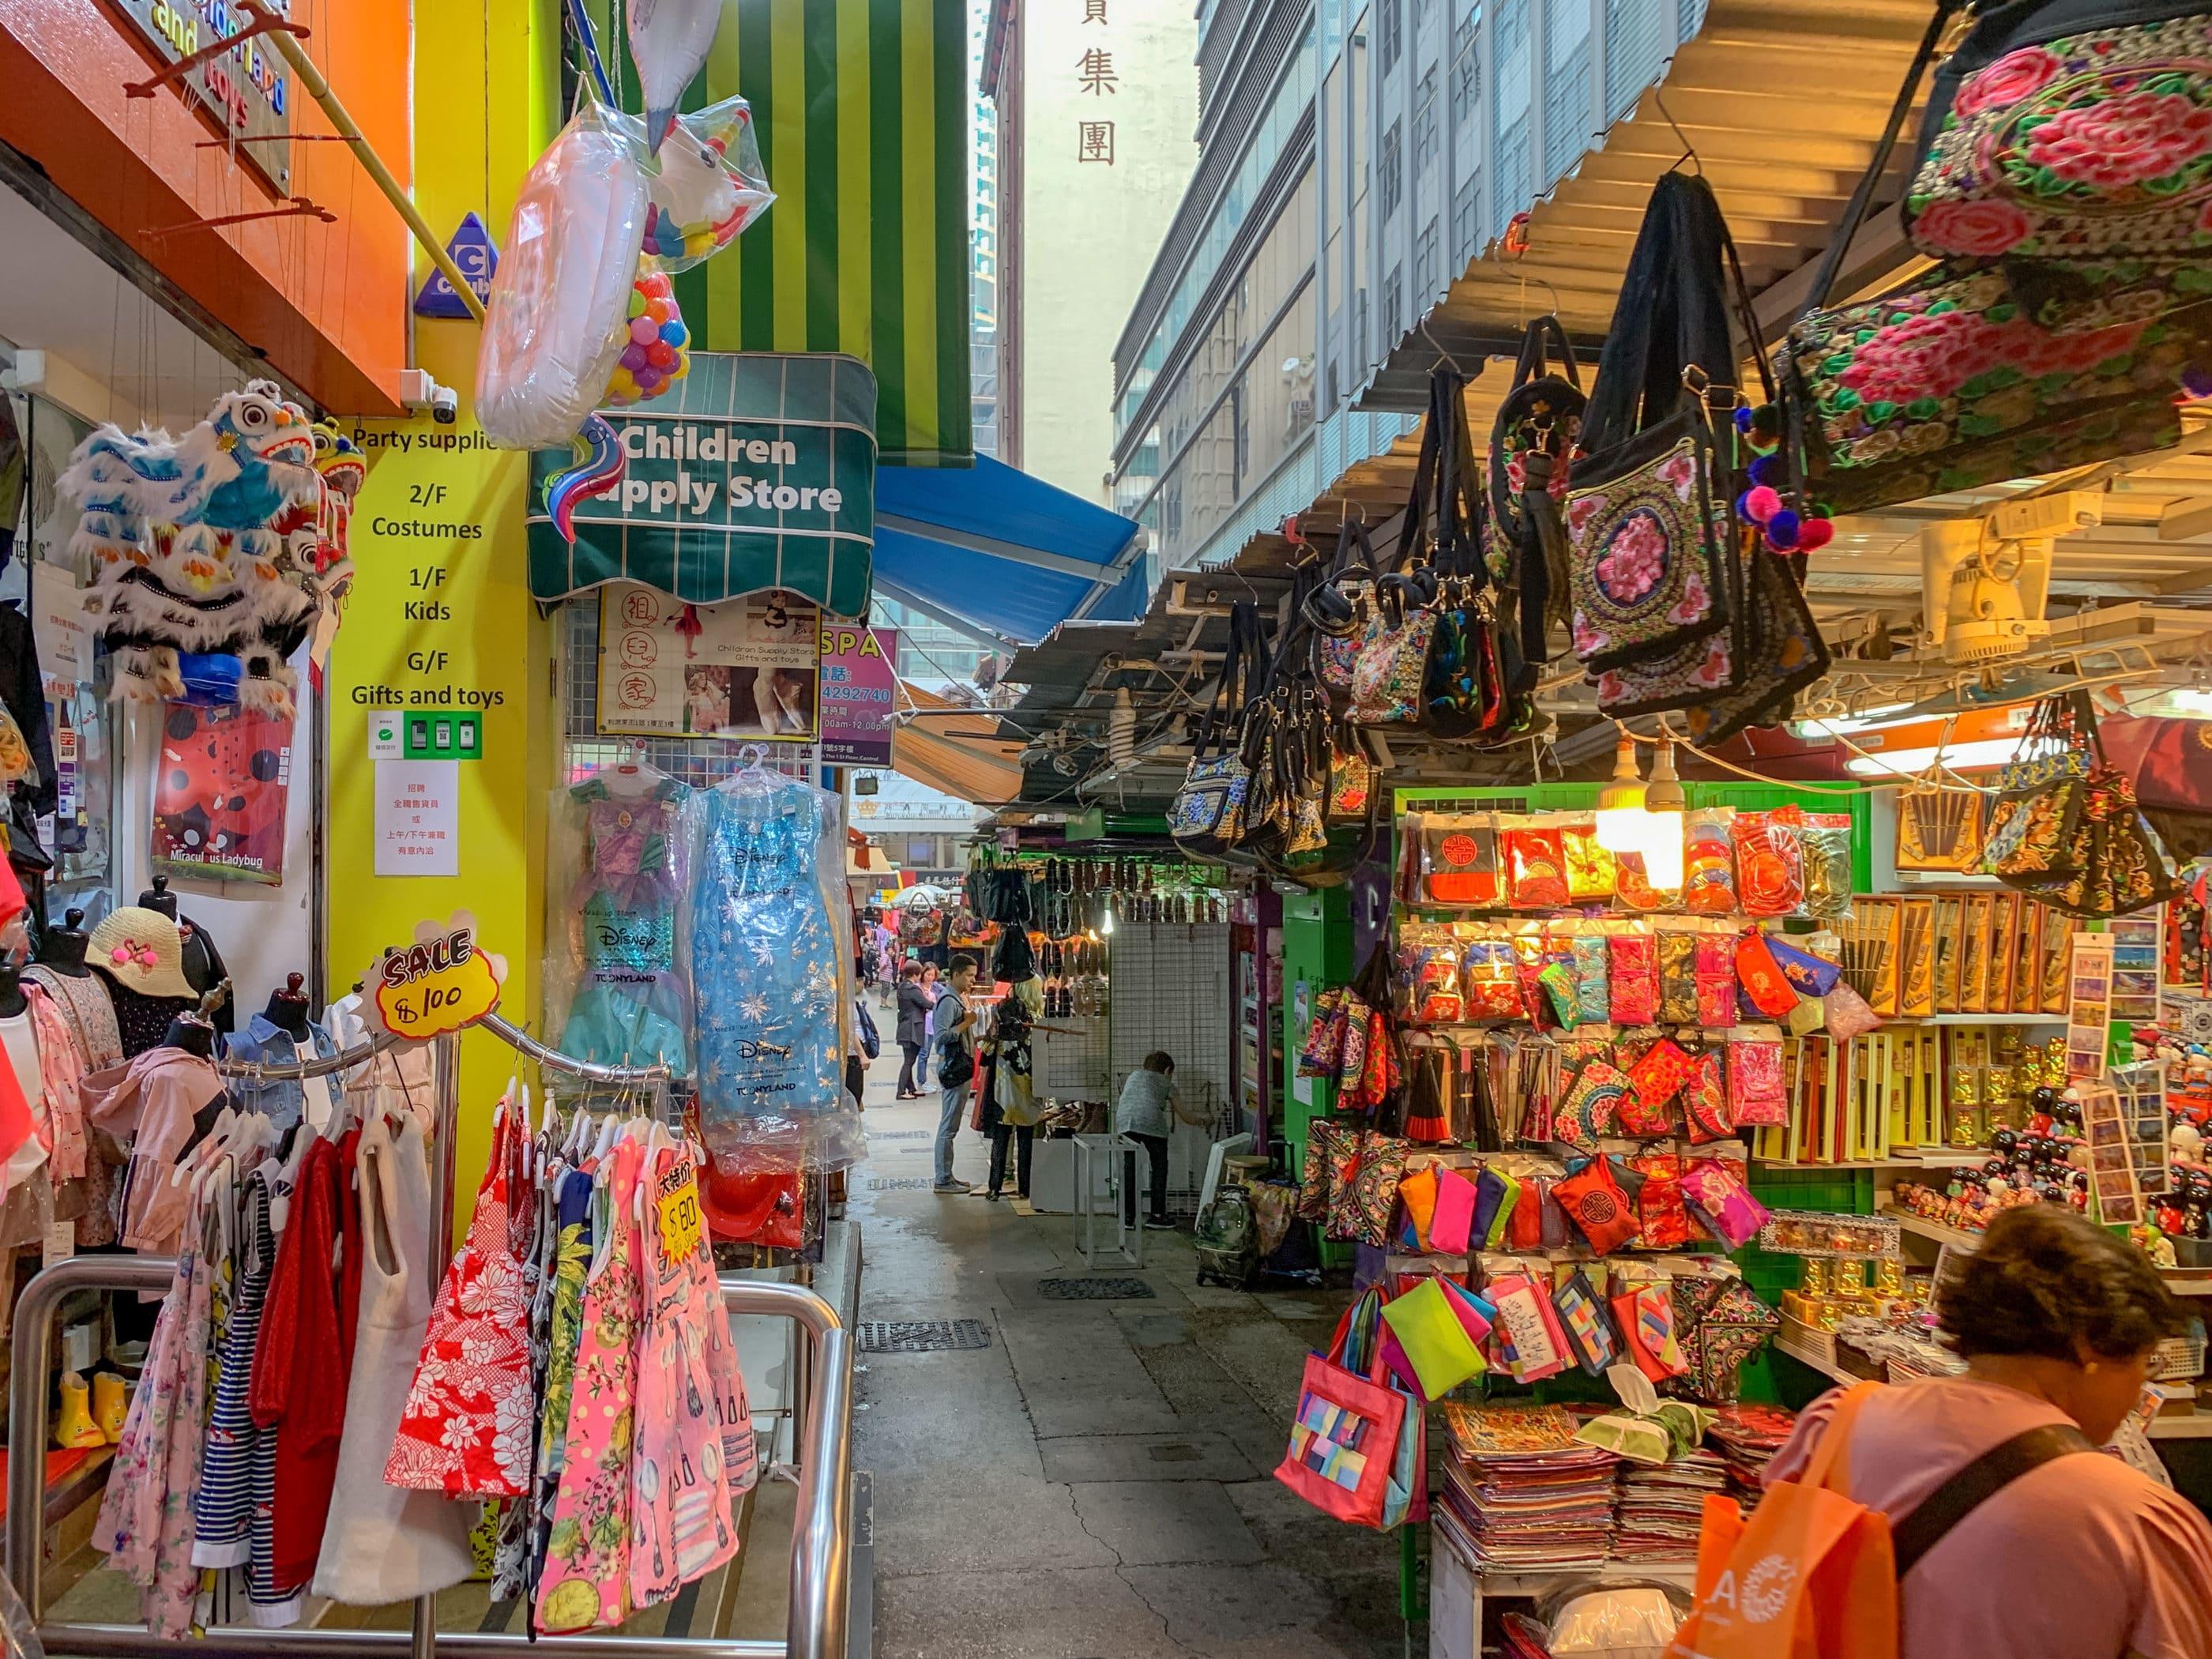 Hong Kong shopping: Li Yuen Street East and Li Yuen Street West otherwise known as The Lanes